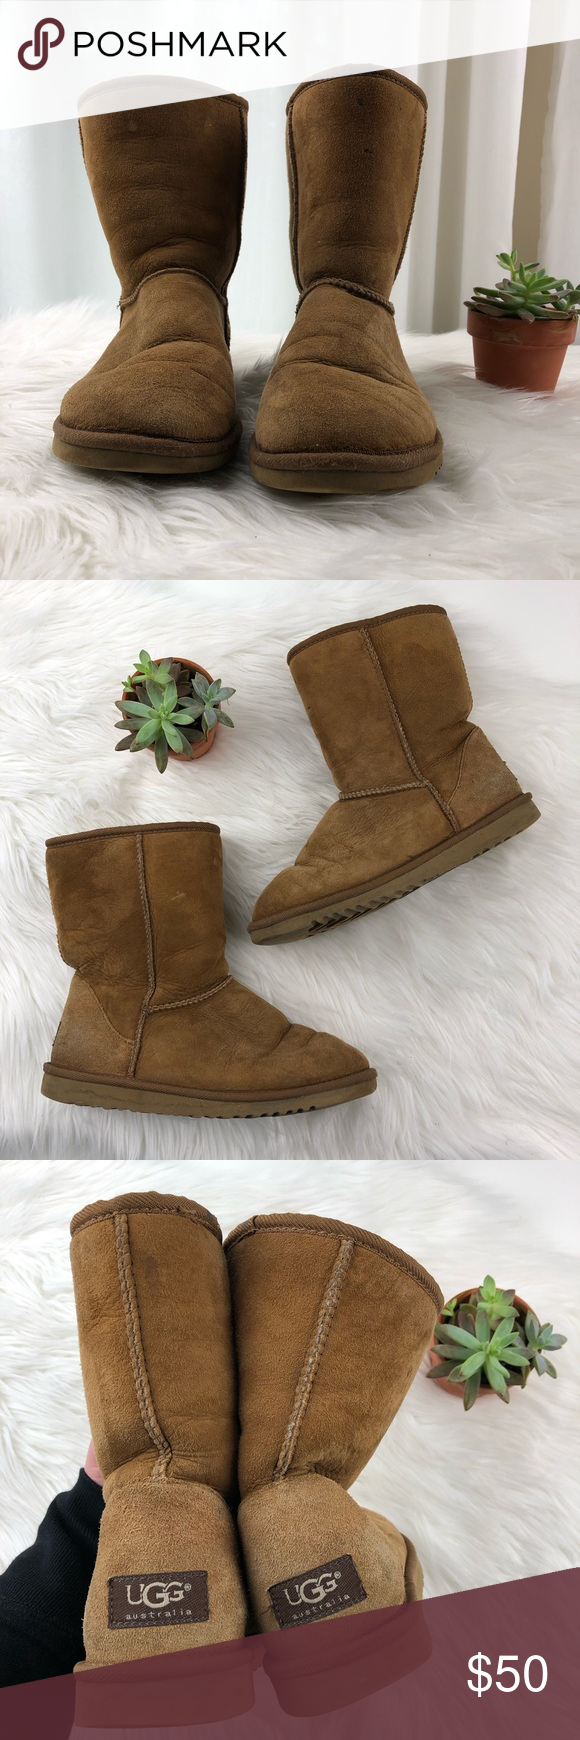 693f60d982c UGG   Classic Short 5825 Chestnut Boots   W6 Chestnut brown Ugg ...